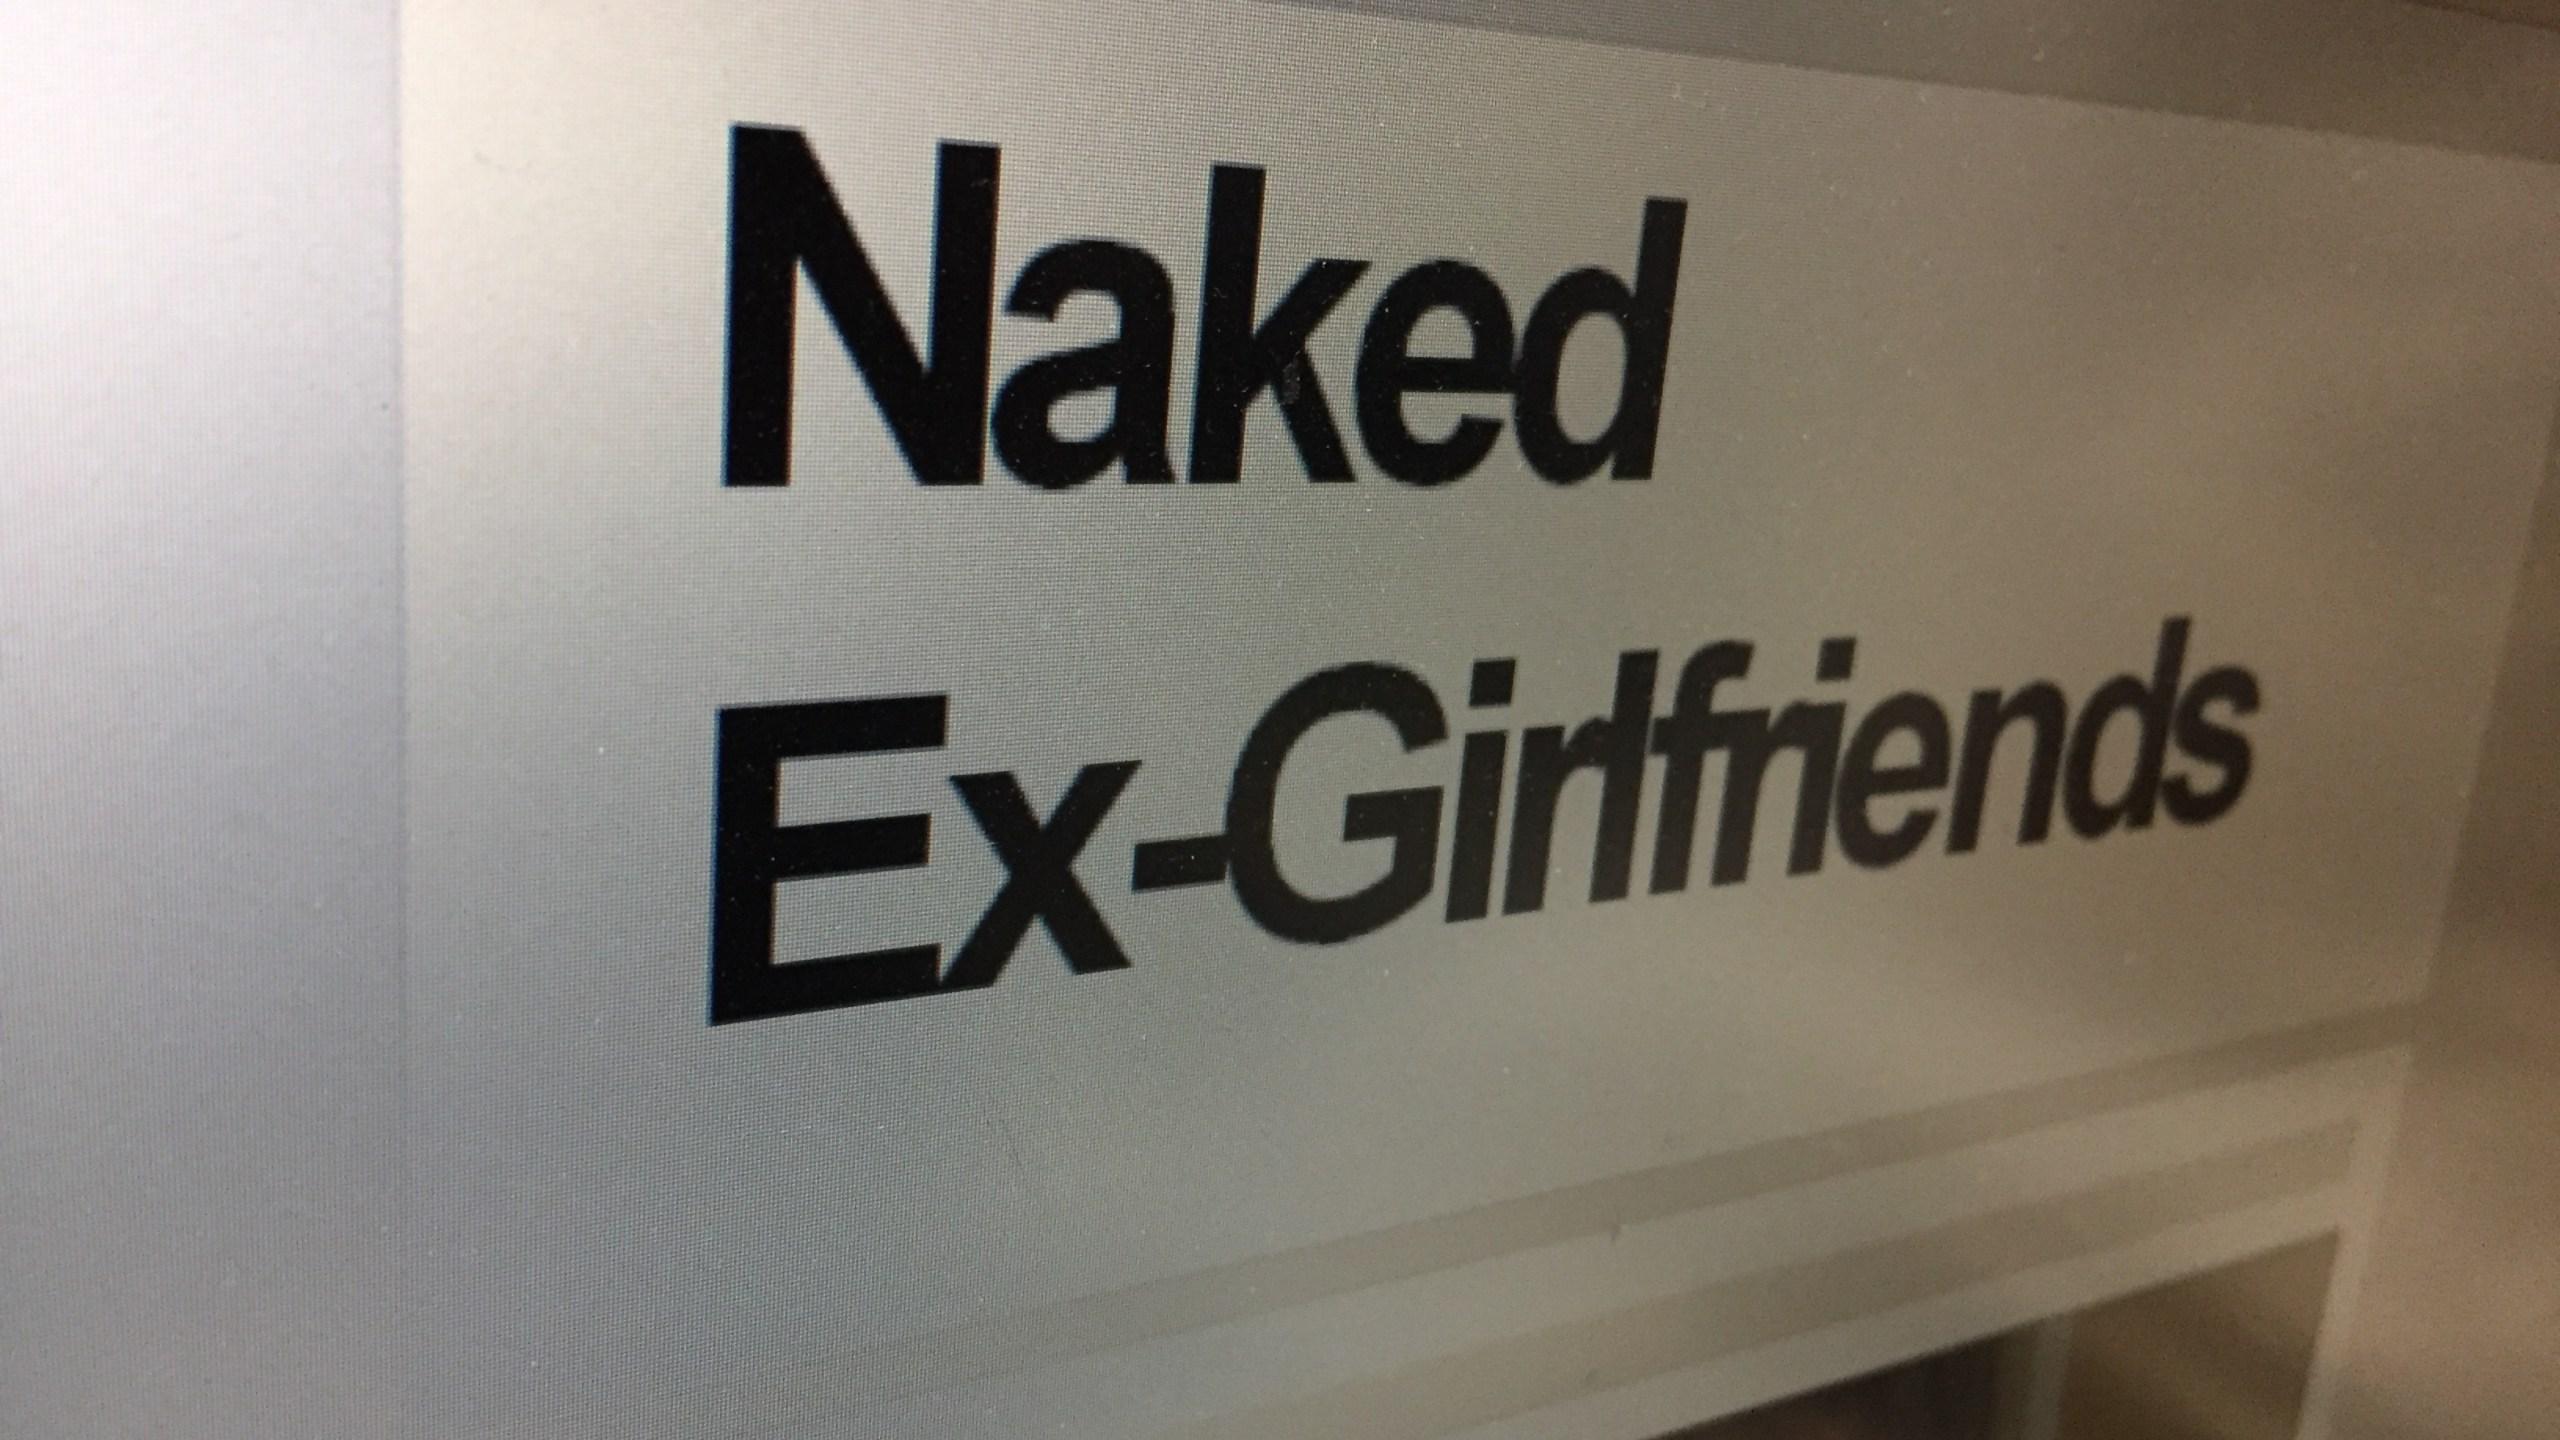 wcbd-naked-ex-girlfriends-website_266407